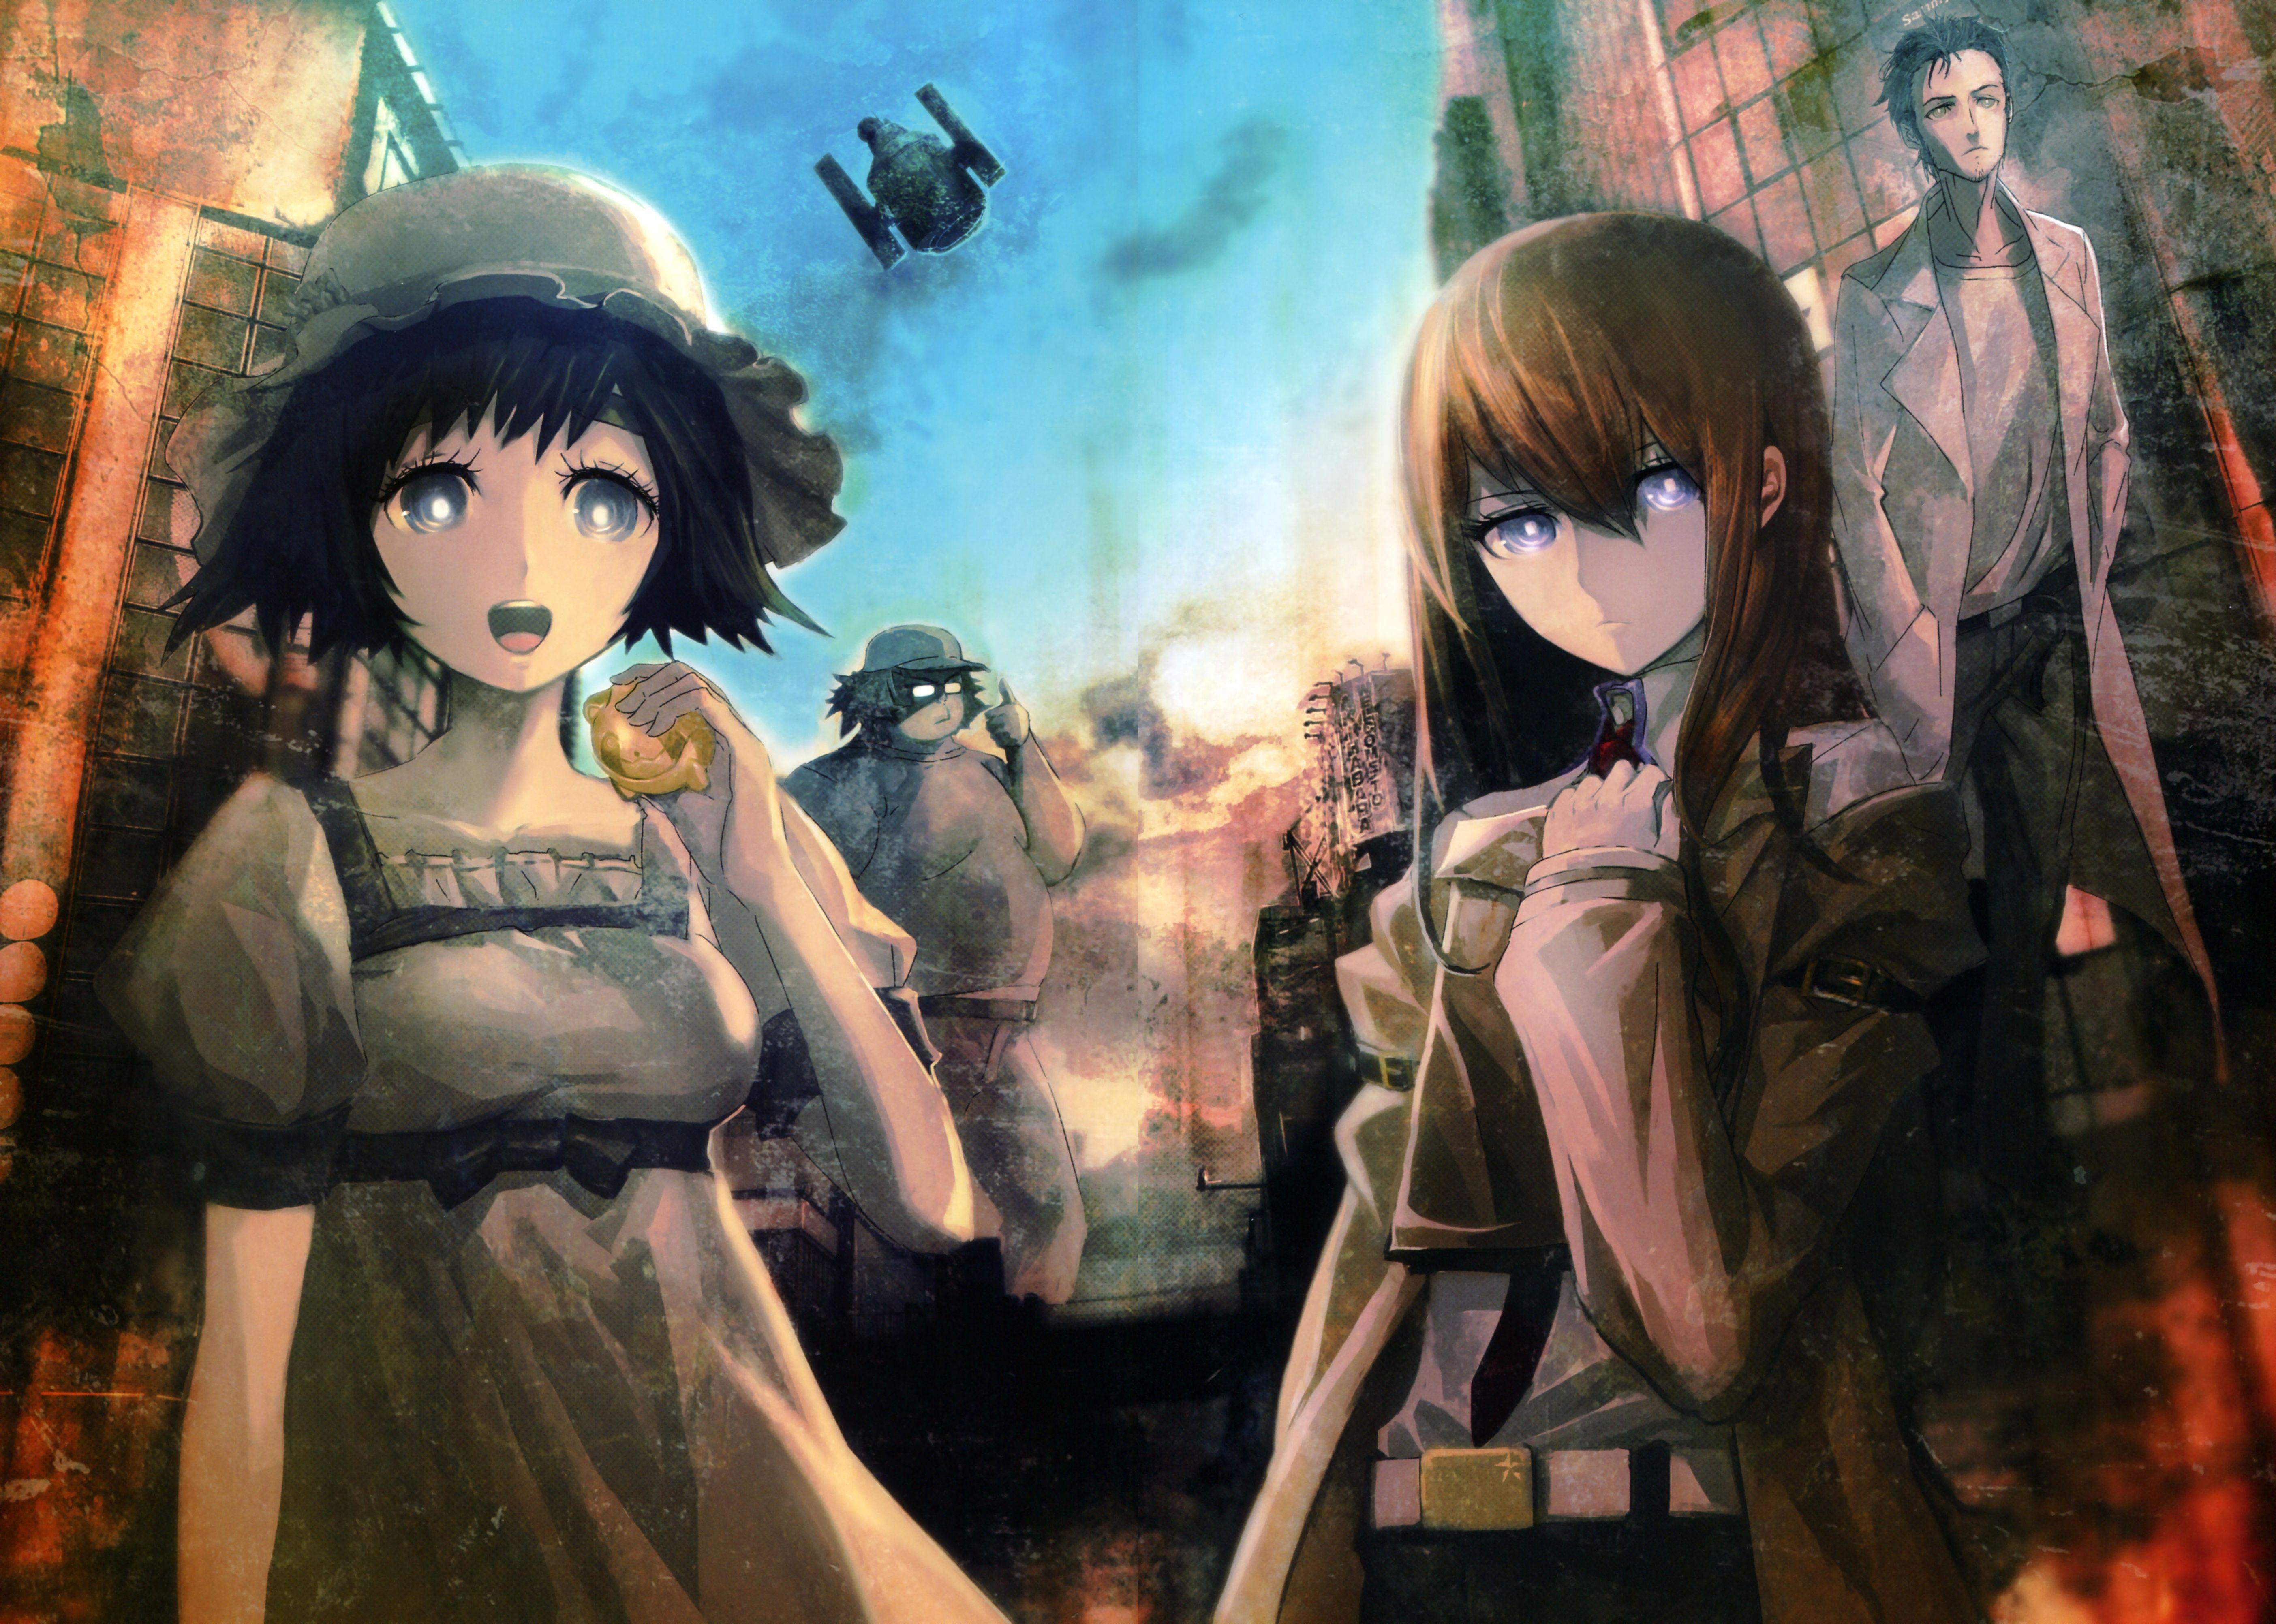 Anime Steins Gate Wallpaper Anime Wallpaper Steins Anime